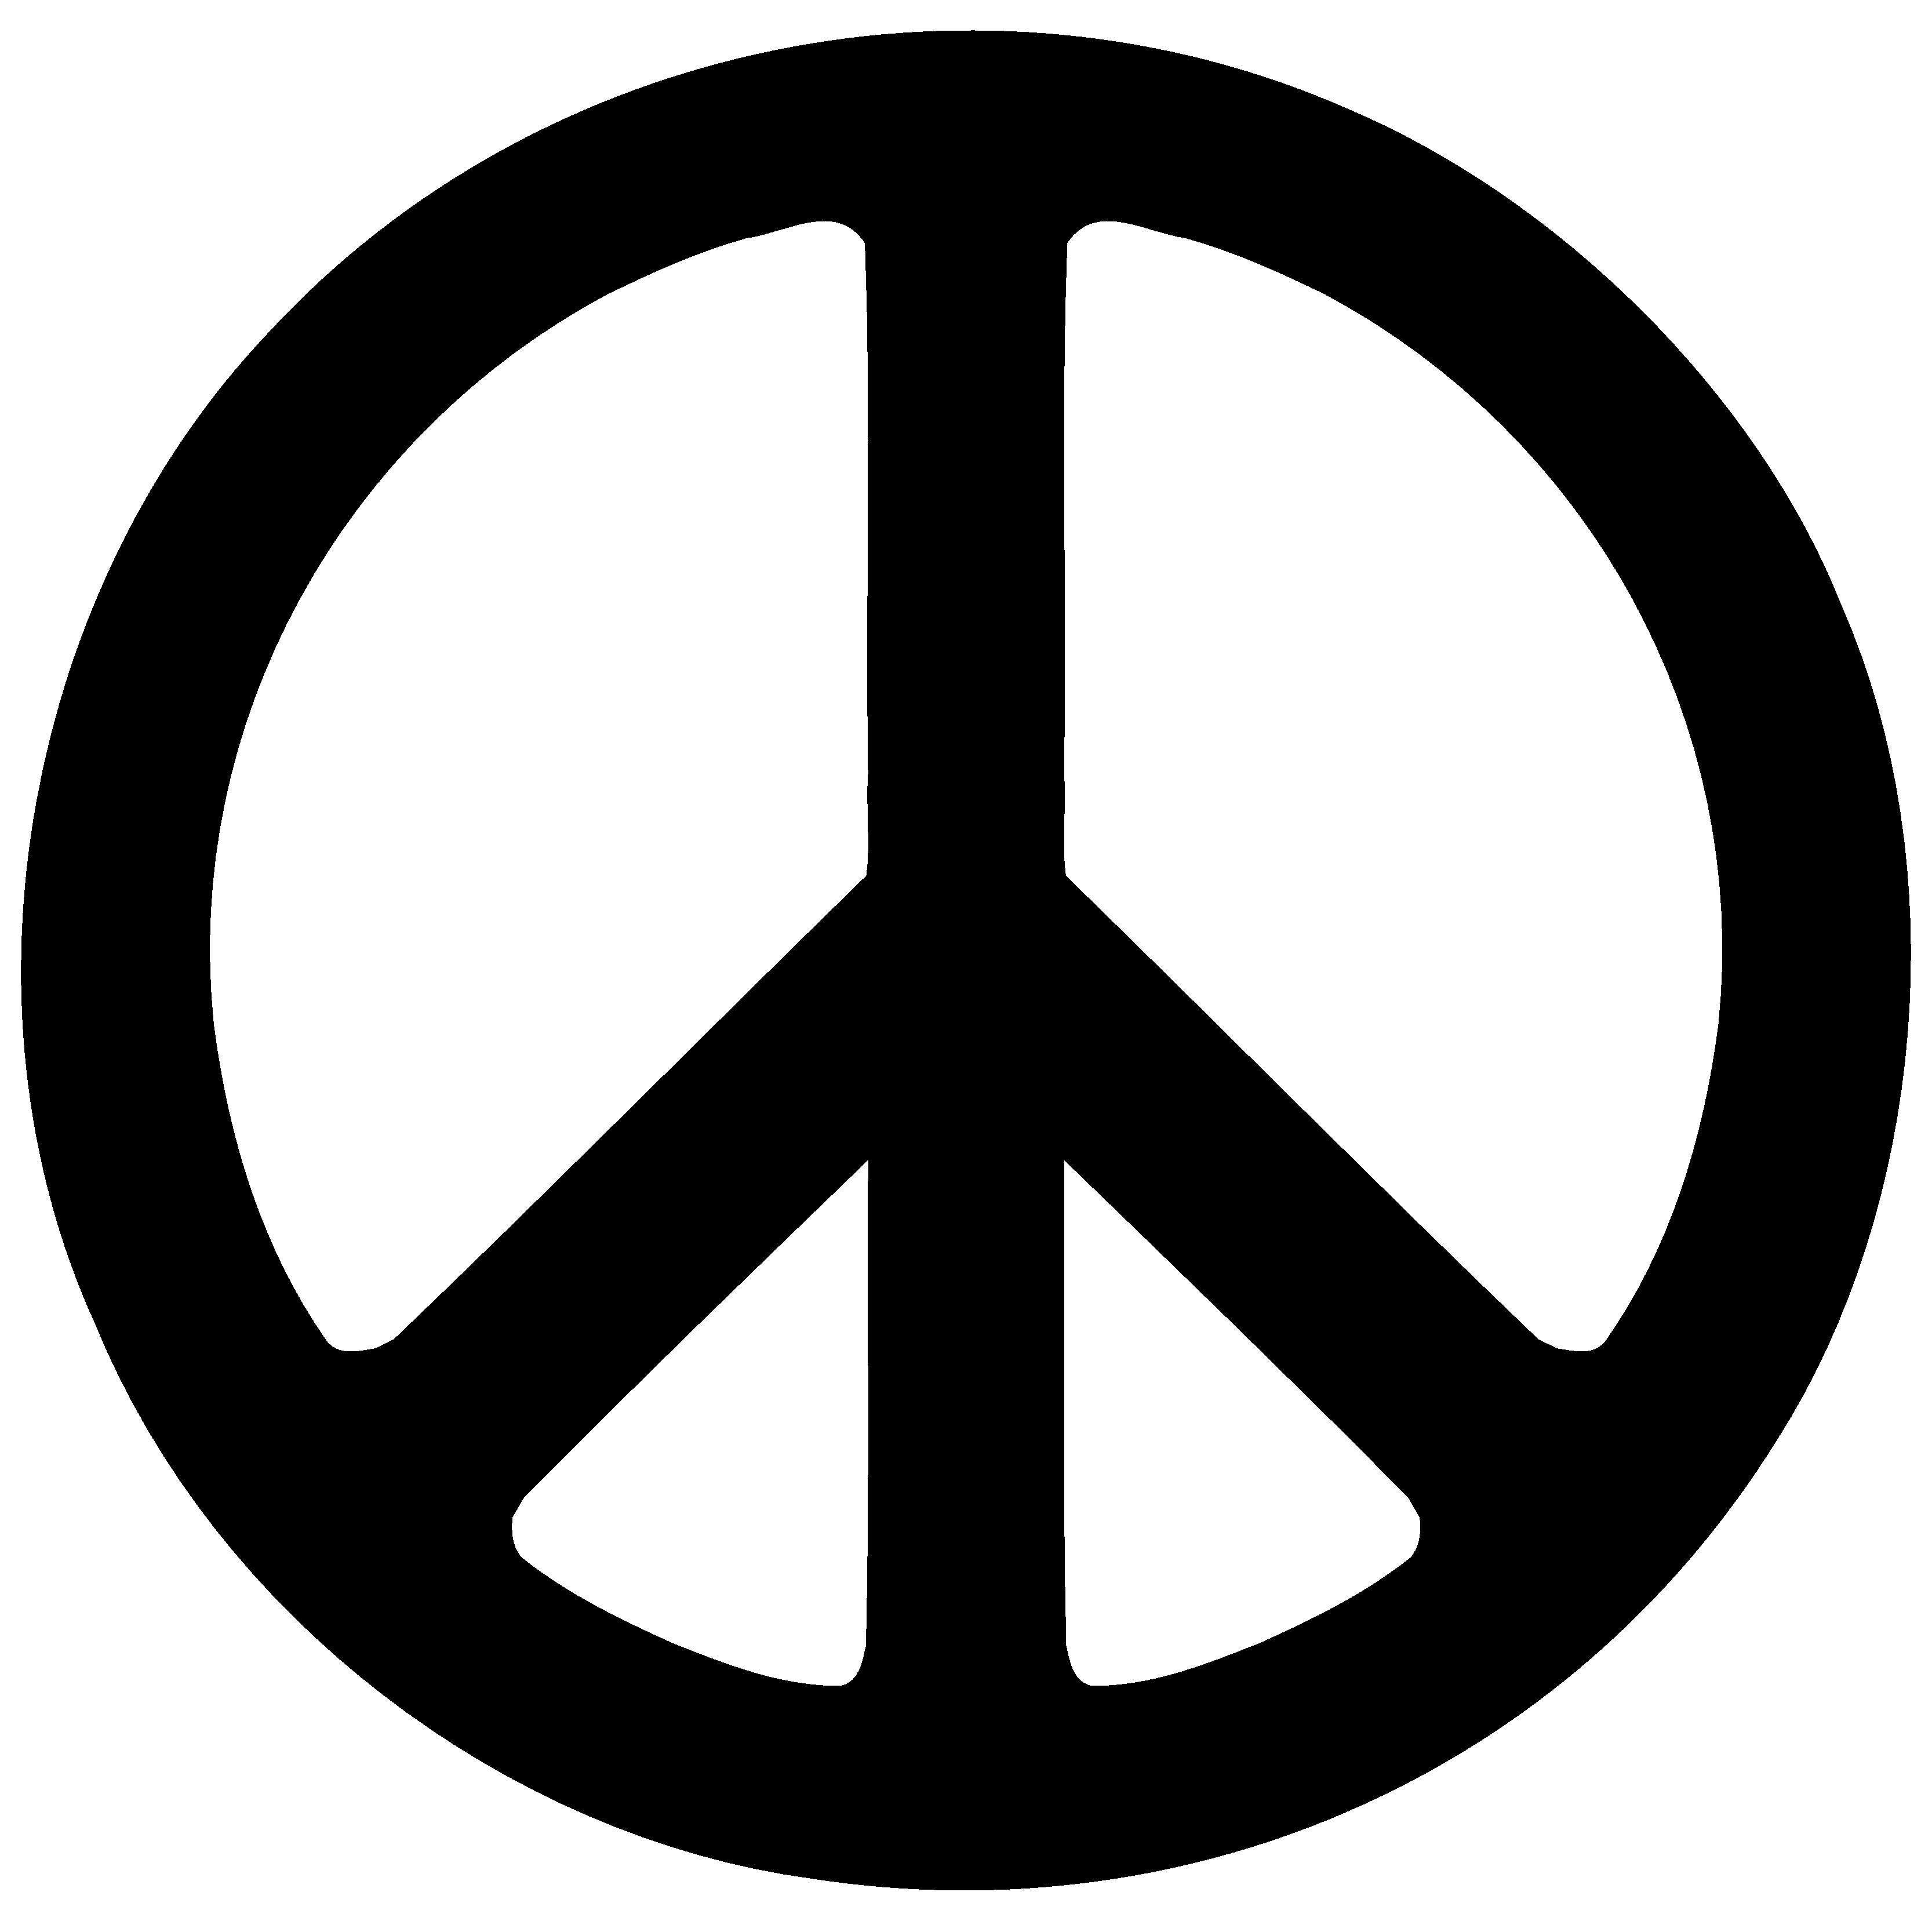 Opaque Peace Symbol Clipart.